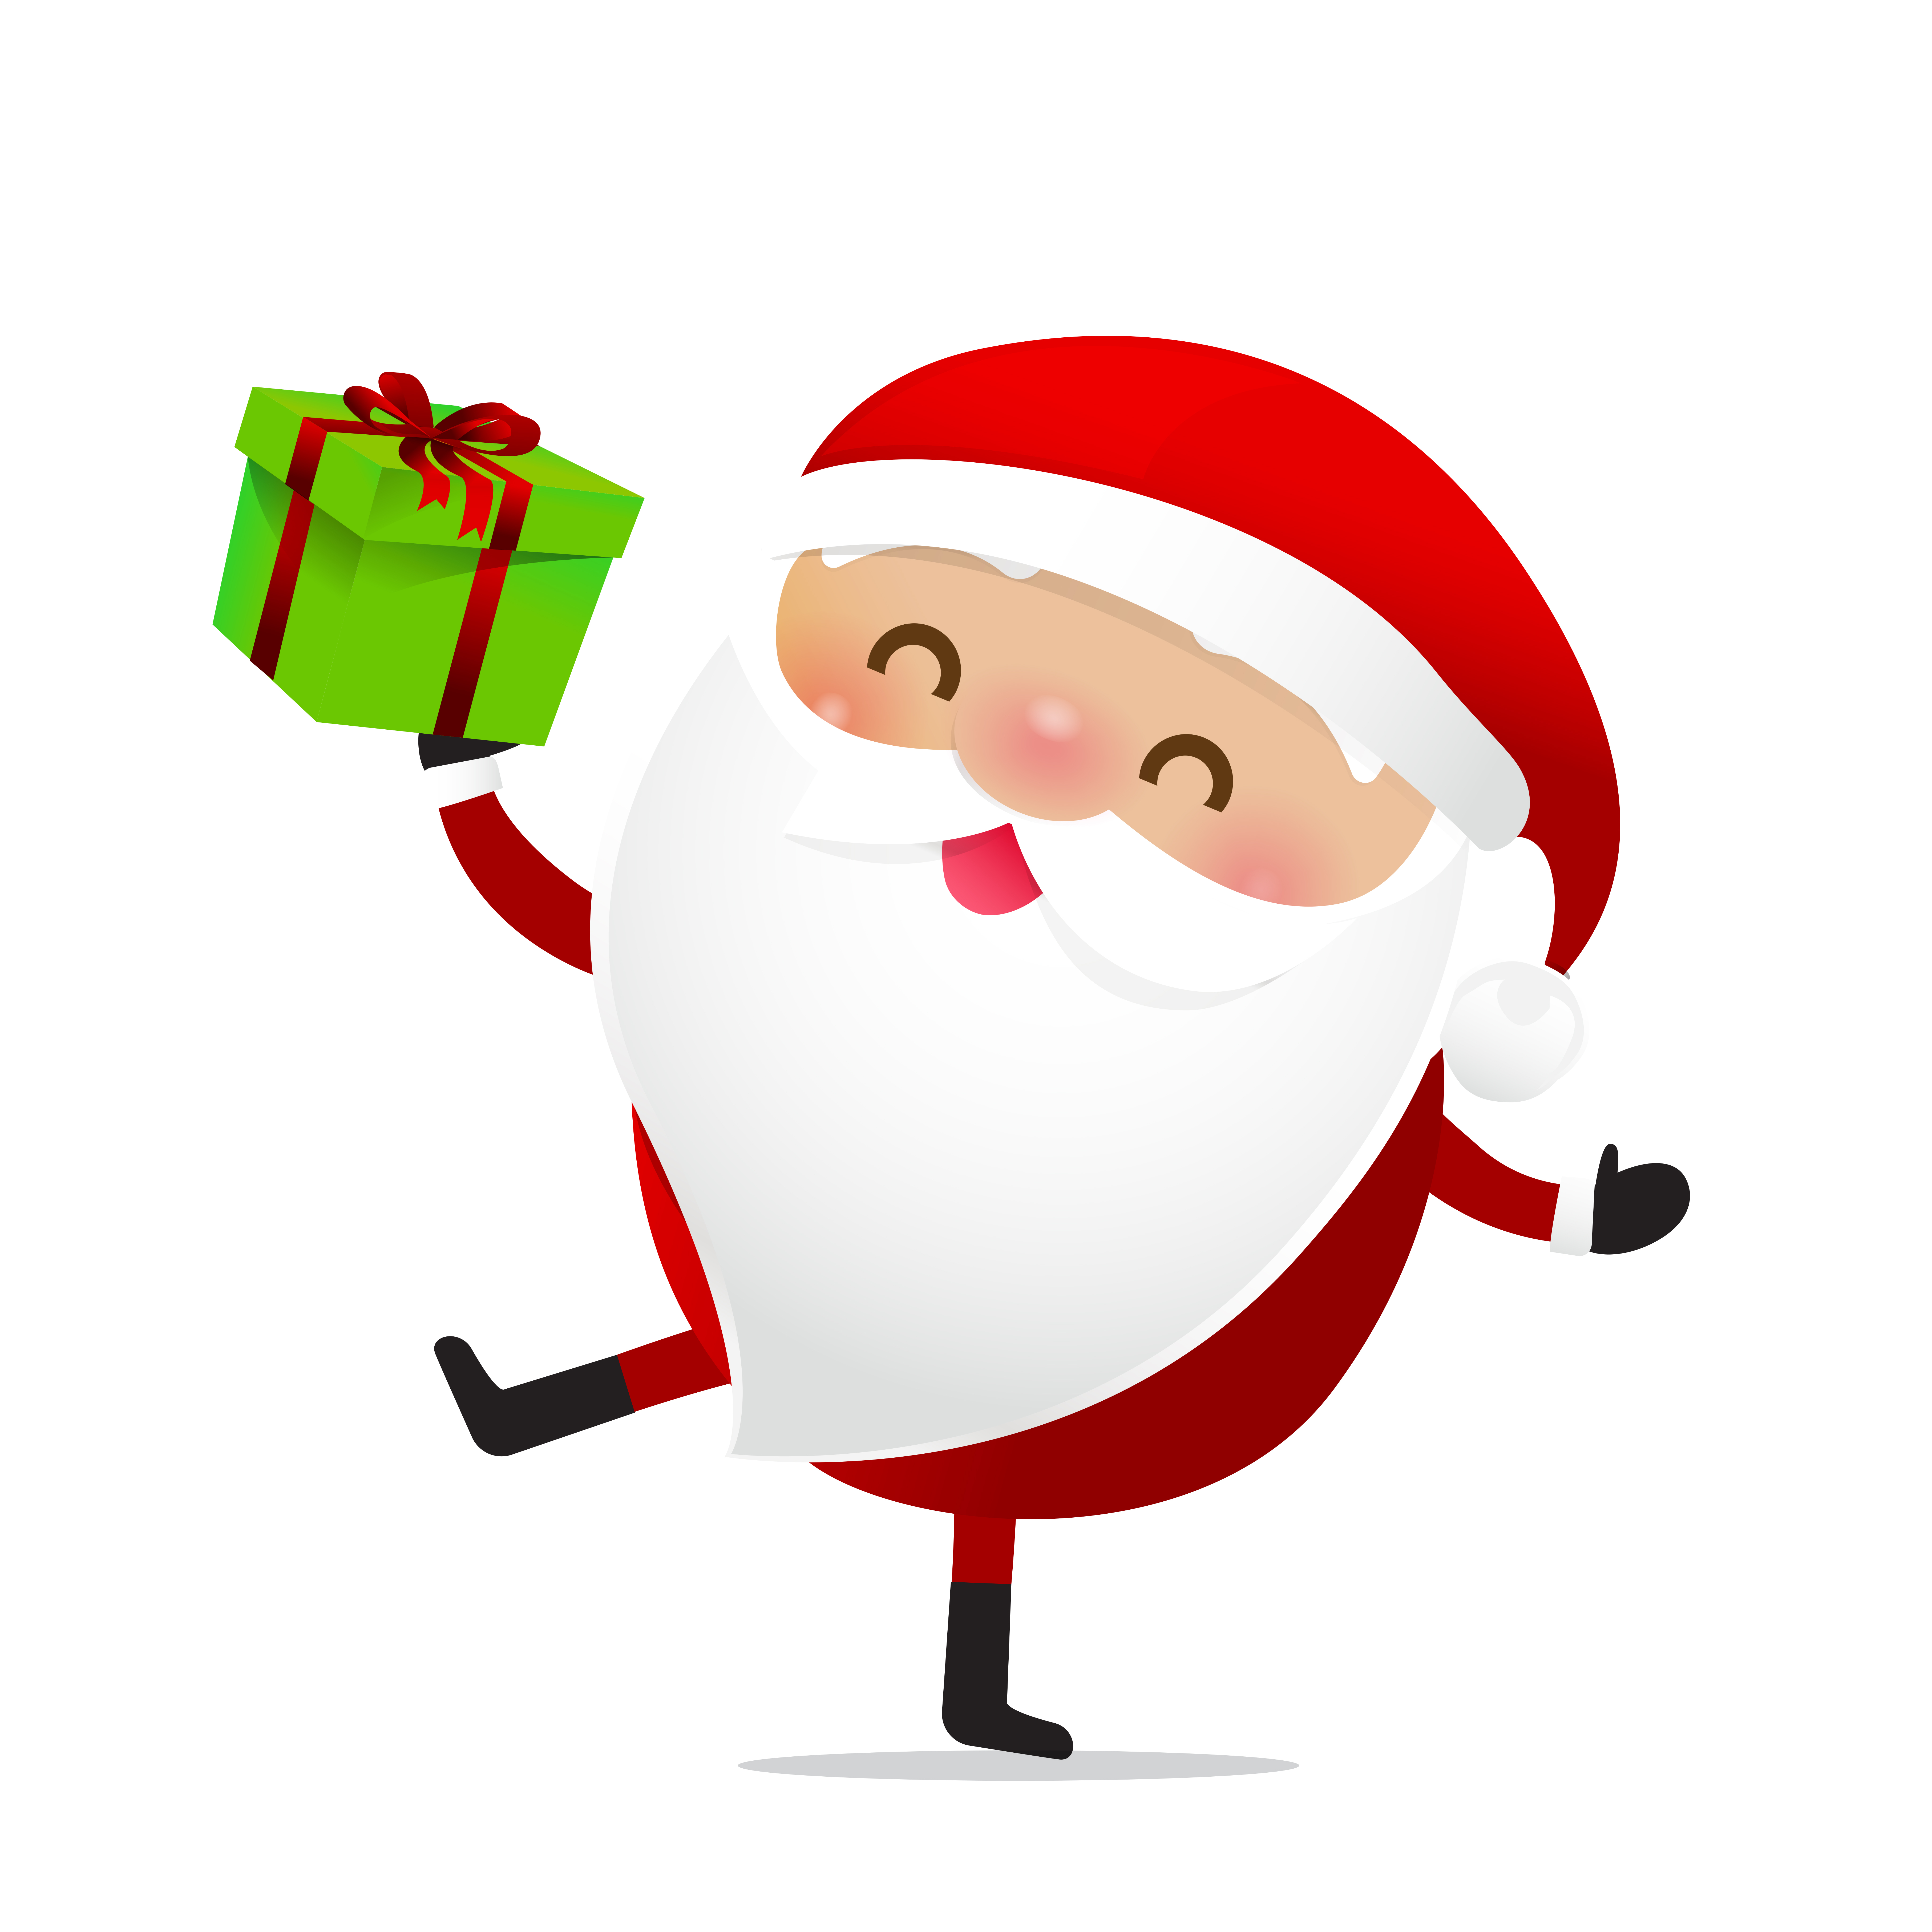 happy christmas character santa claus cartoon 023 download free vectors clipart graphics vector art vecteezy